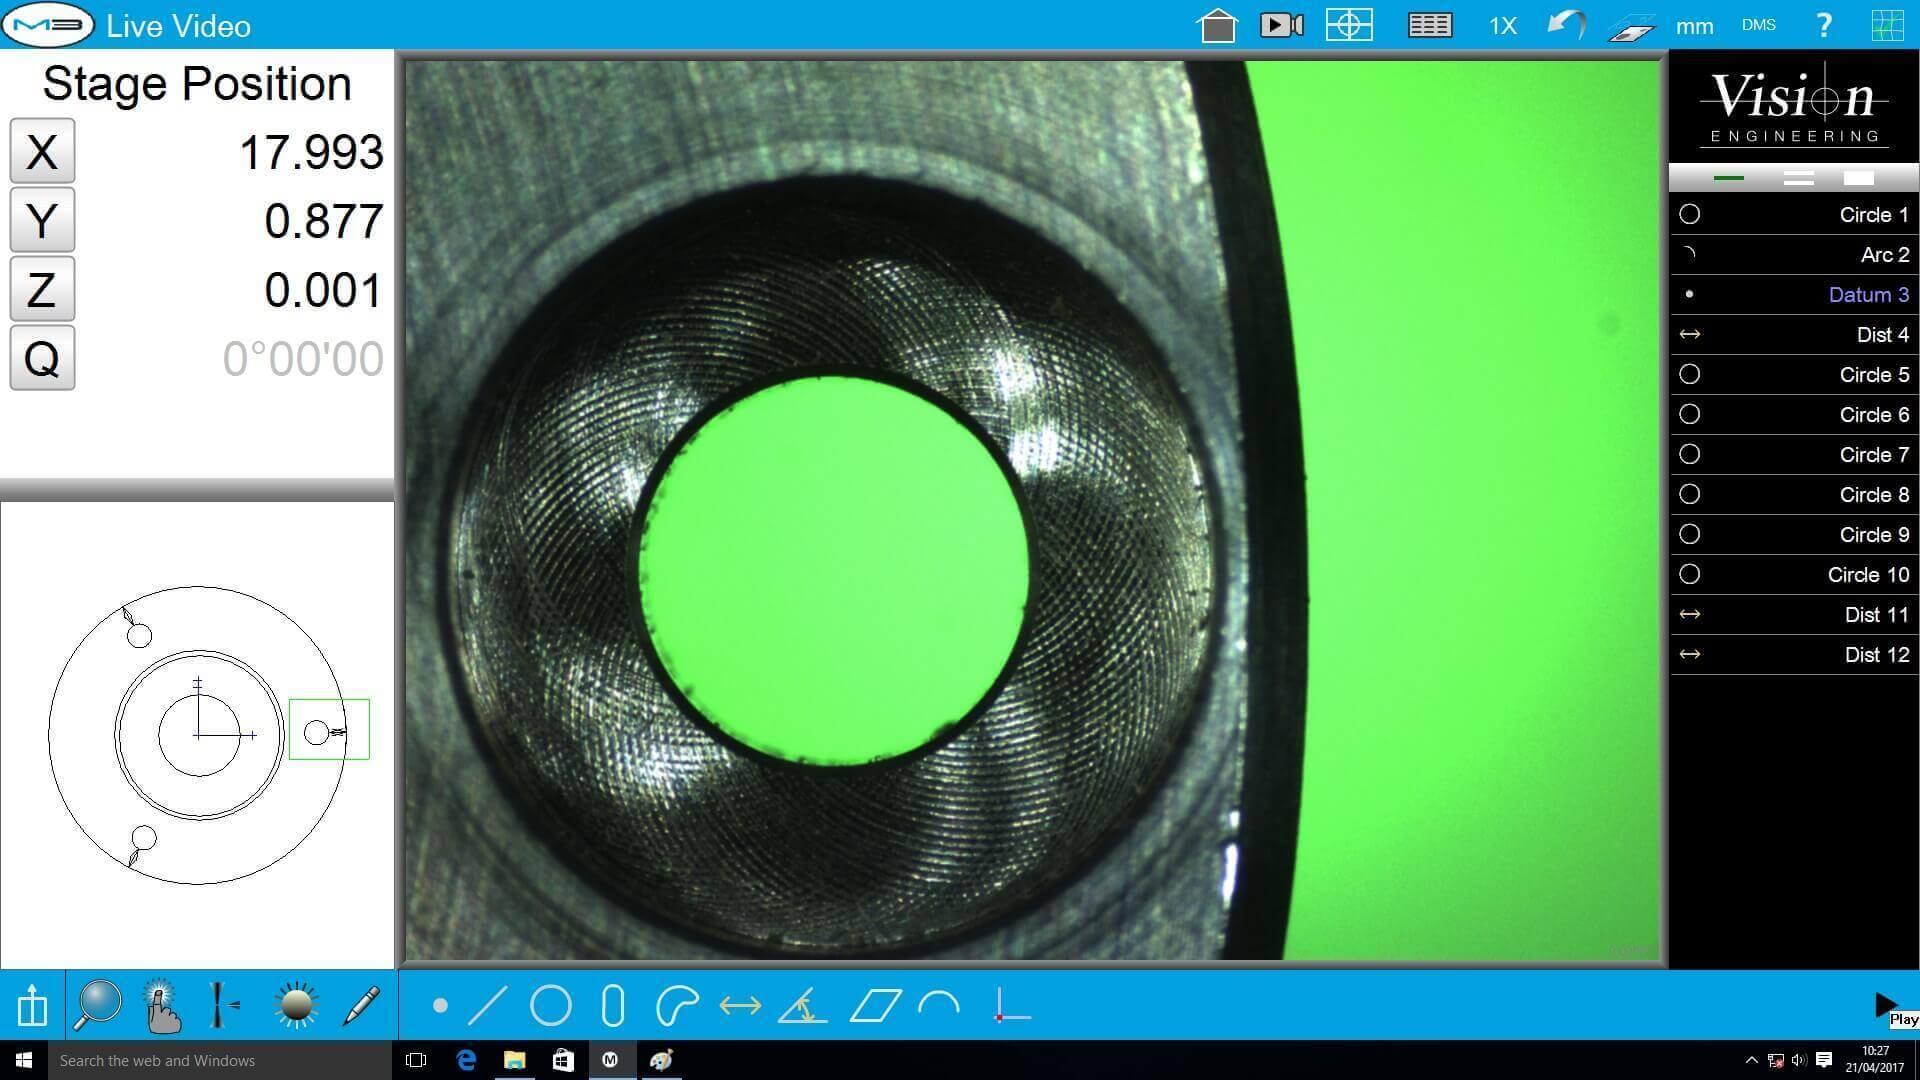 03-Swift-PRO-dynascope-AB-V19-494-crop-900x900